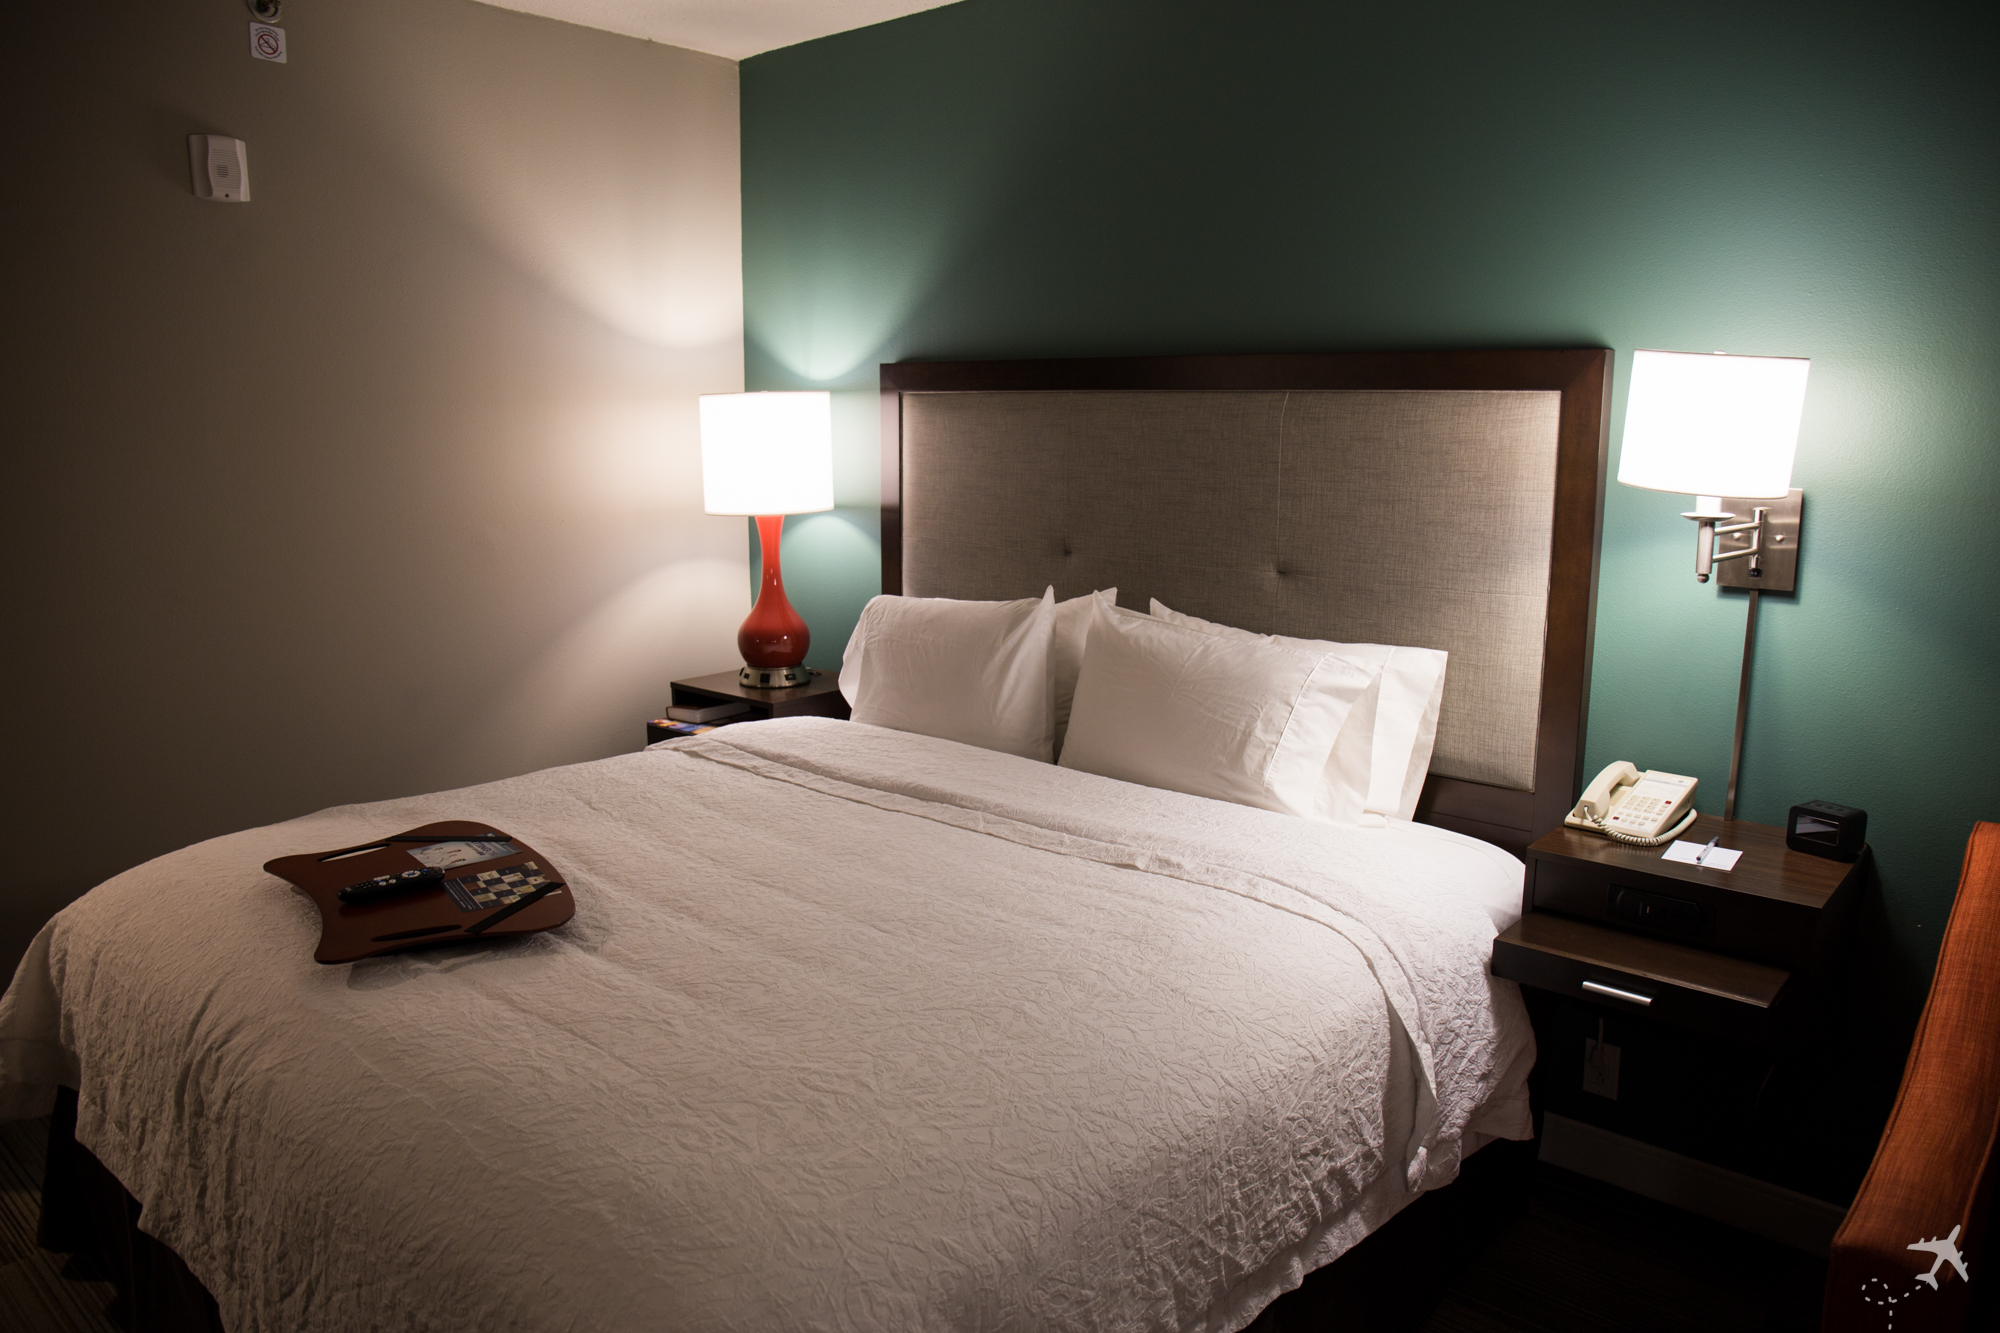 Bett - Hampton Inn & Suites New Orleans-Convention Center